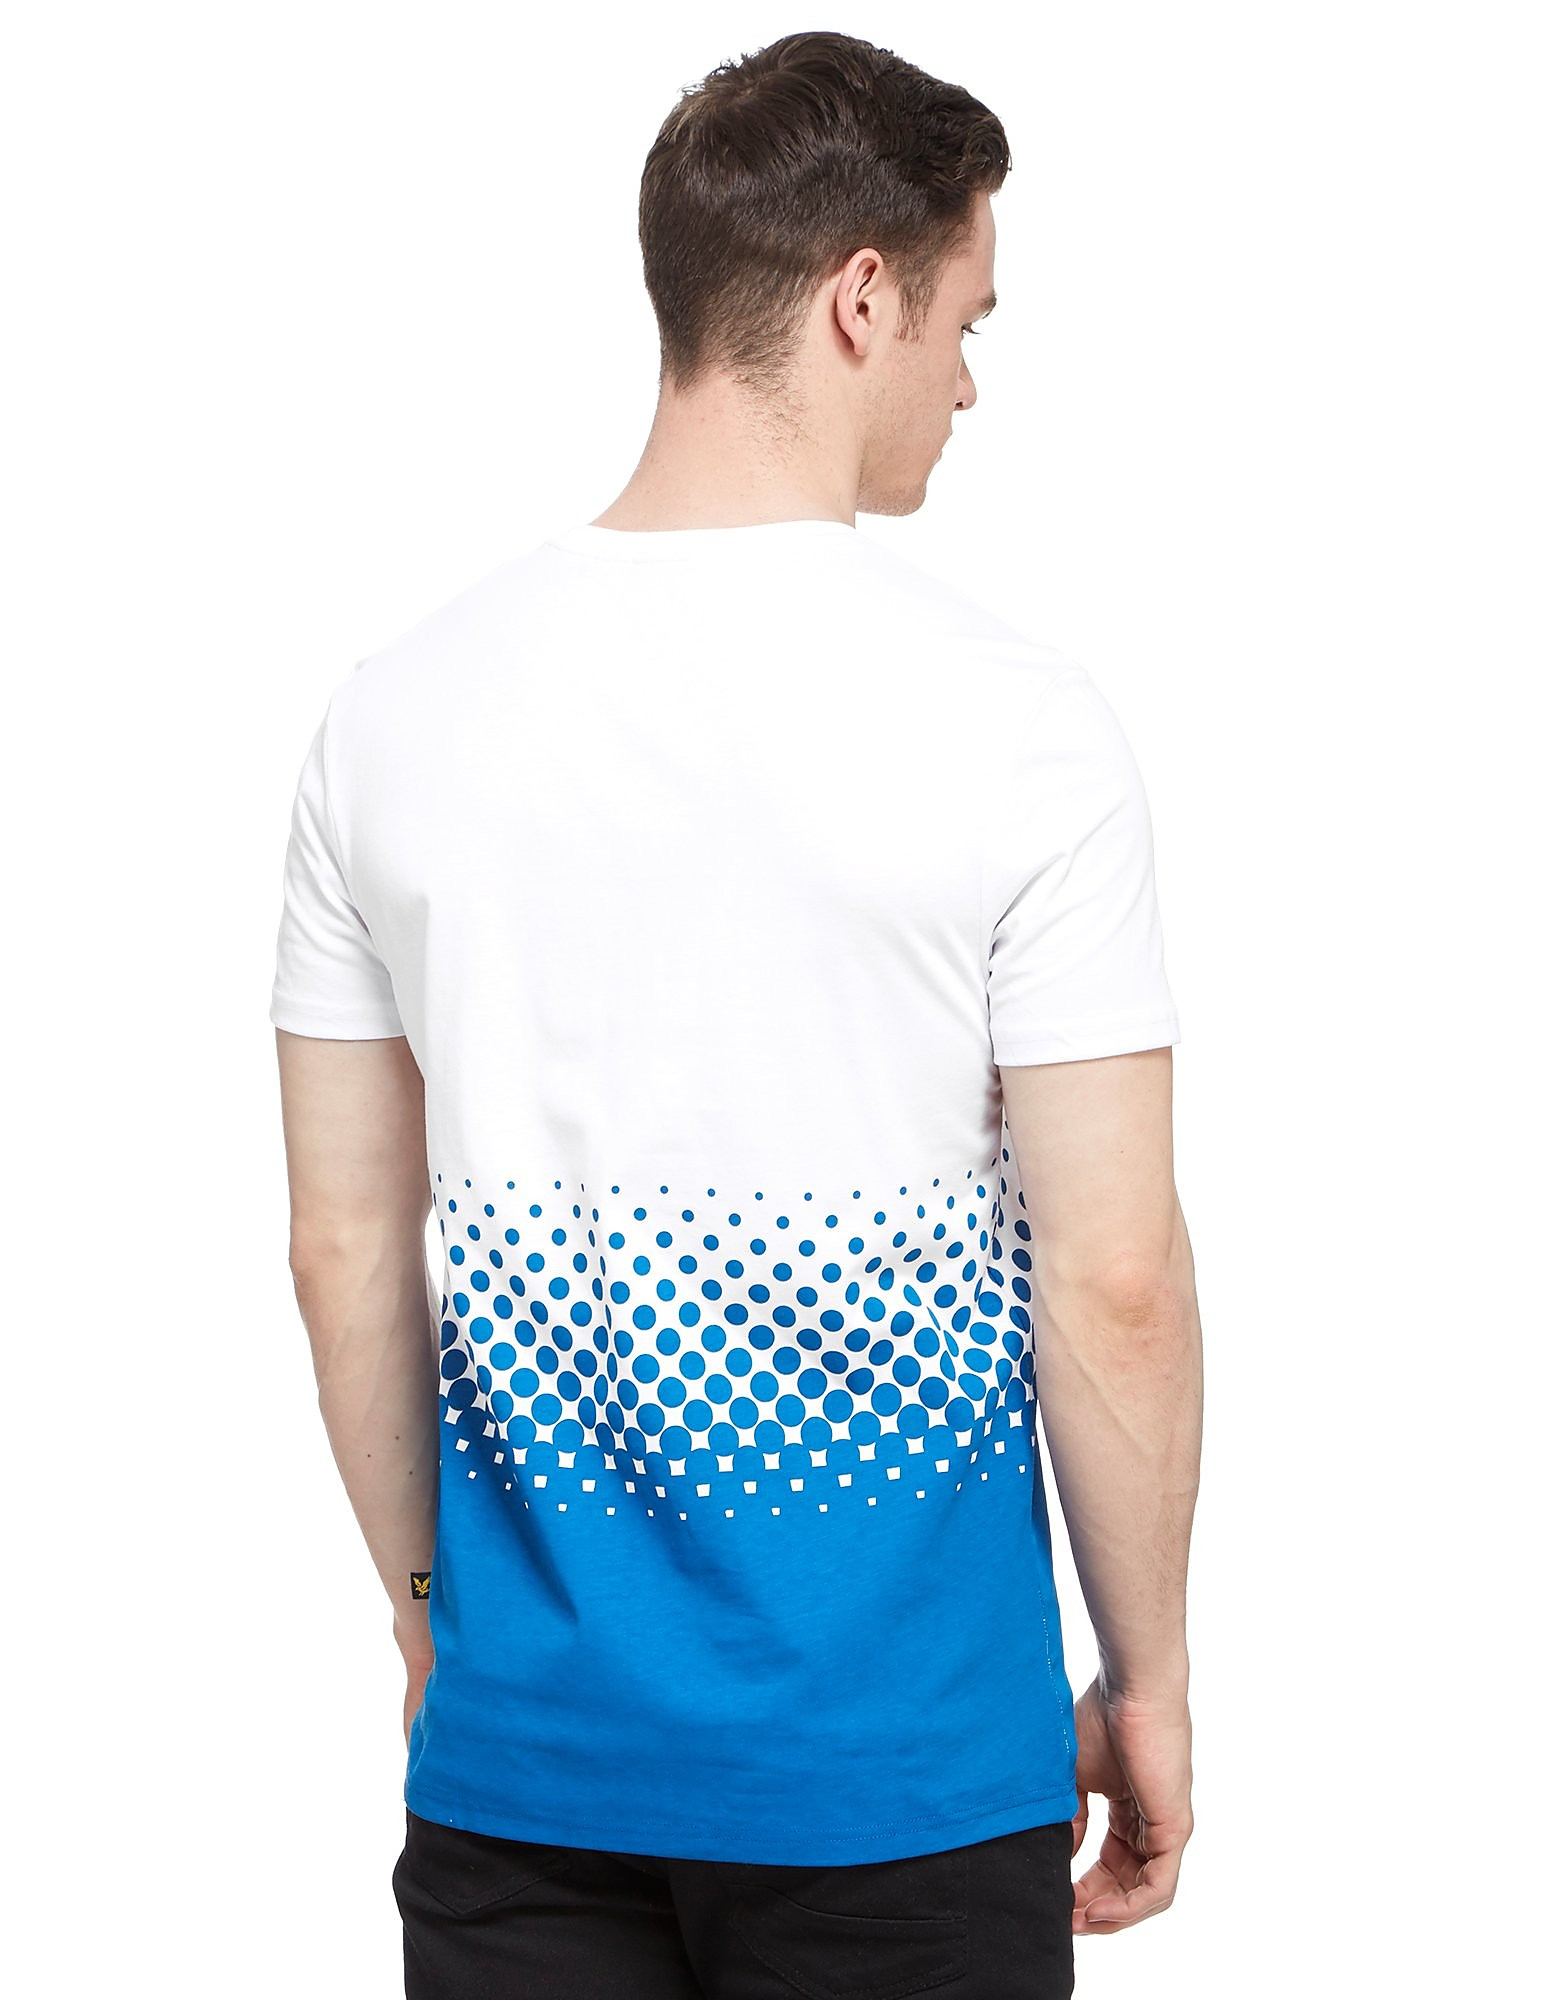 Lyle & Scott Lennox Fitness T-Shirt